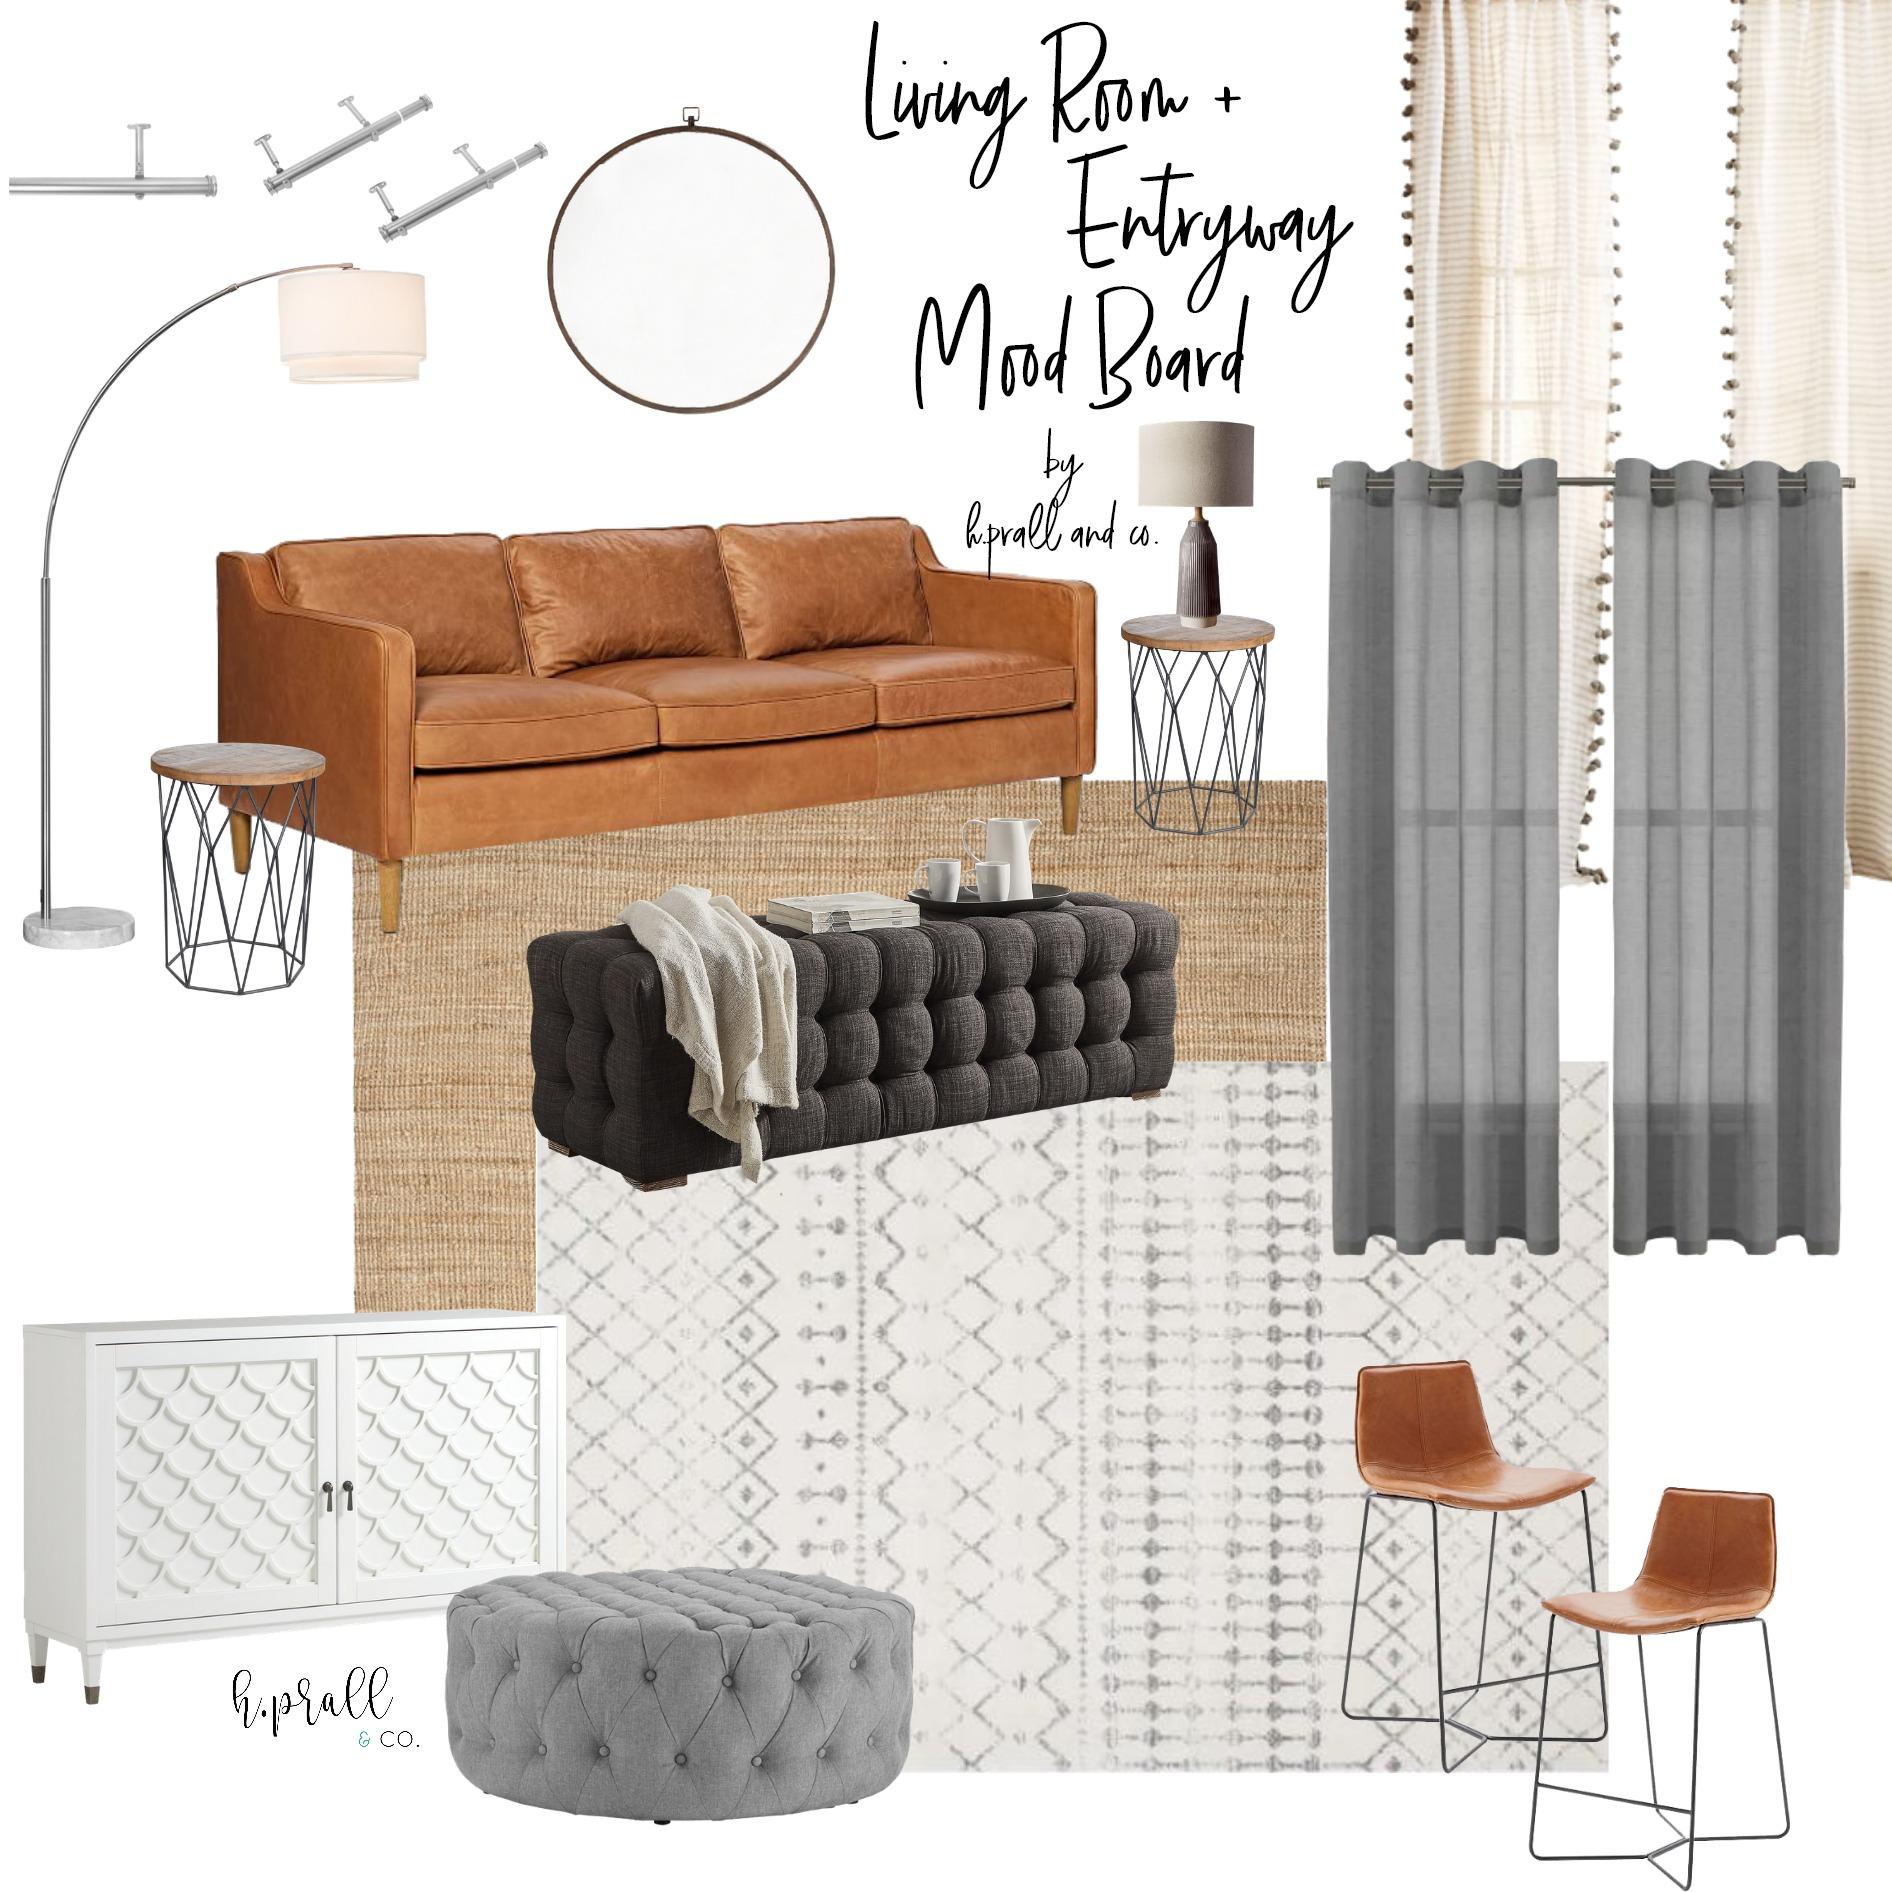 Living Room + Entryway Mood Board Design from HPrallandCo.com